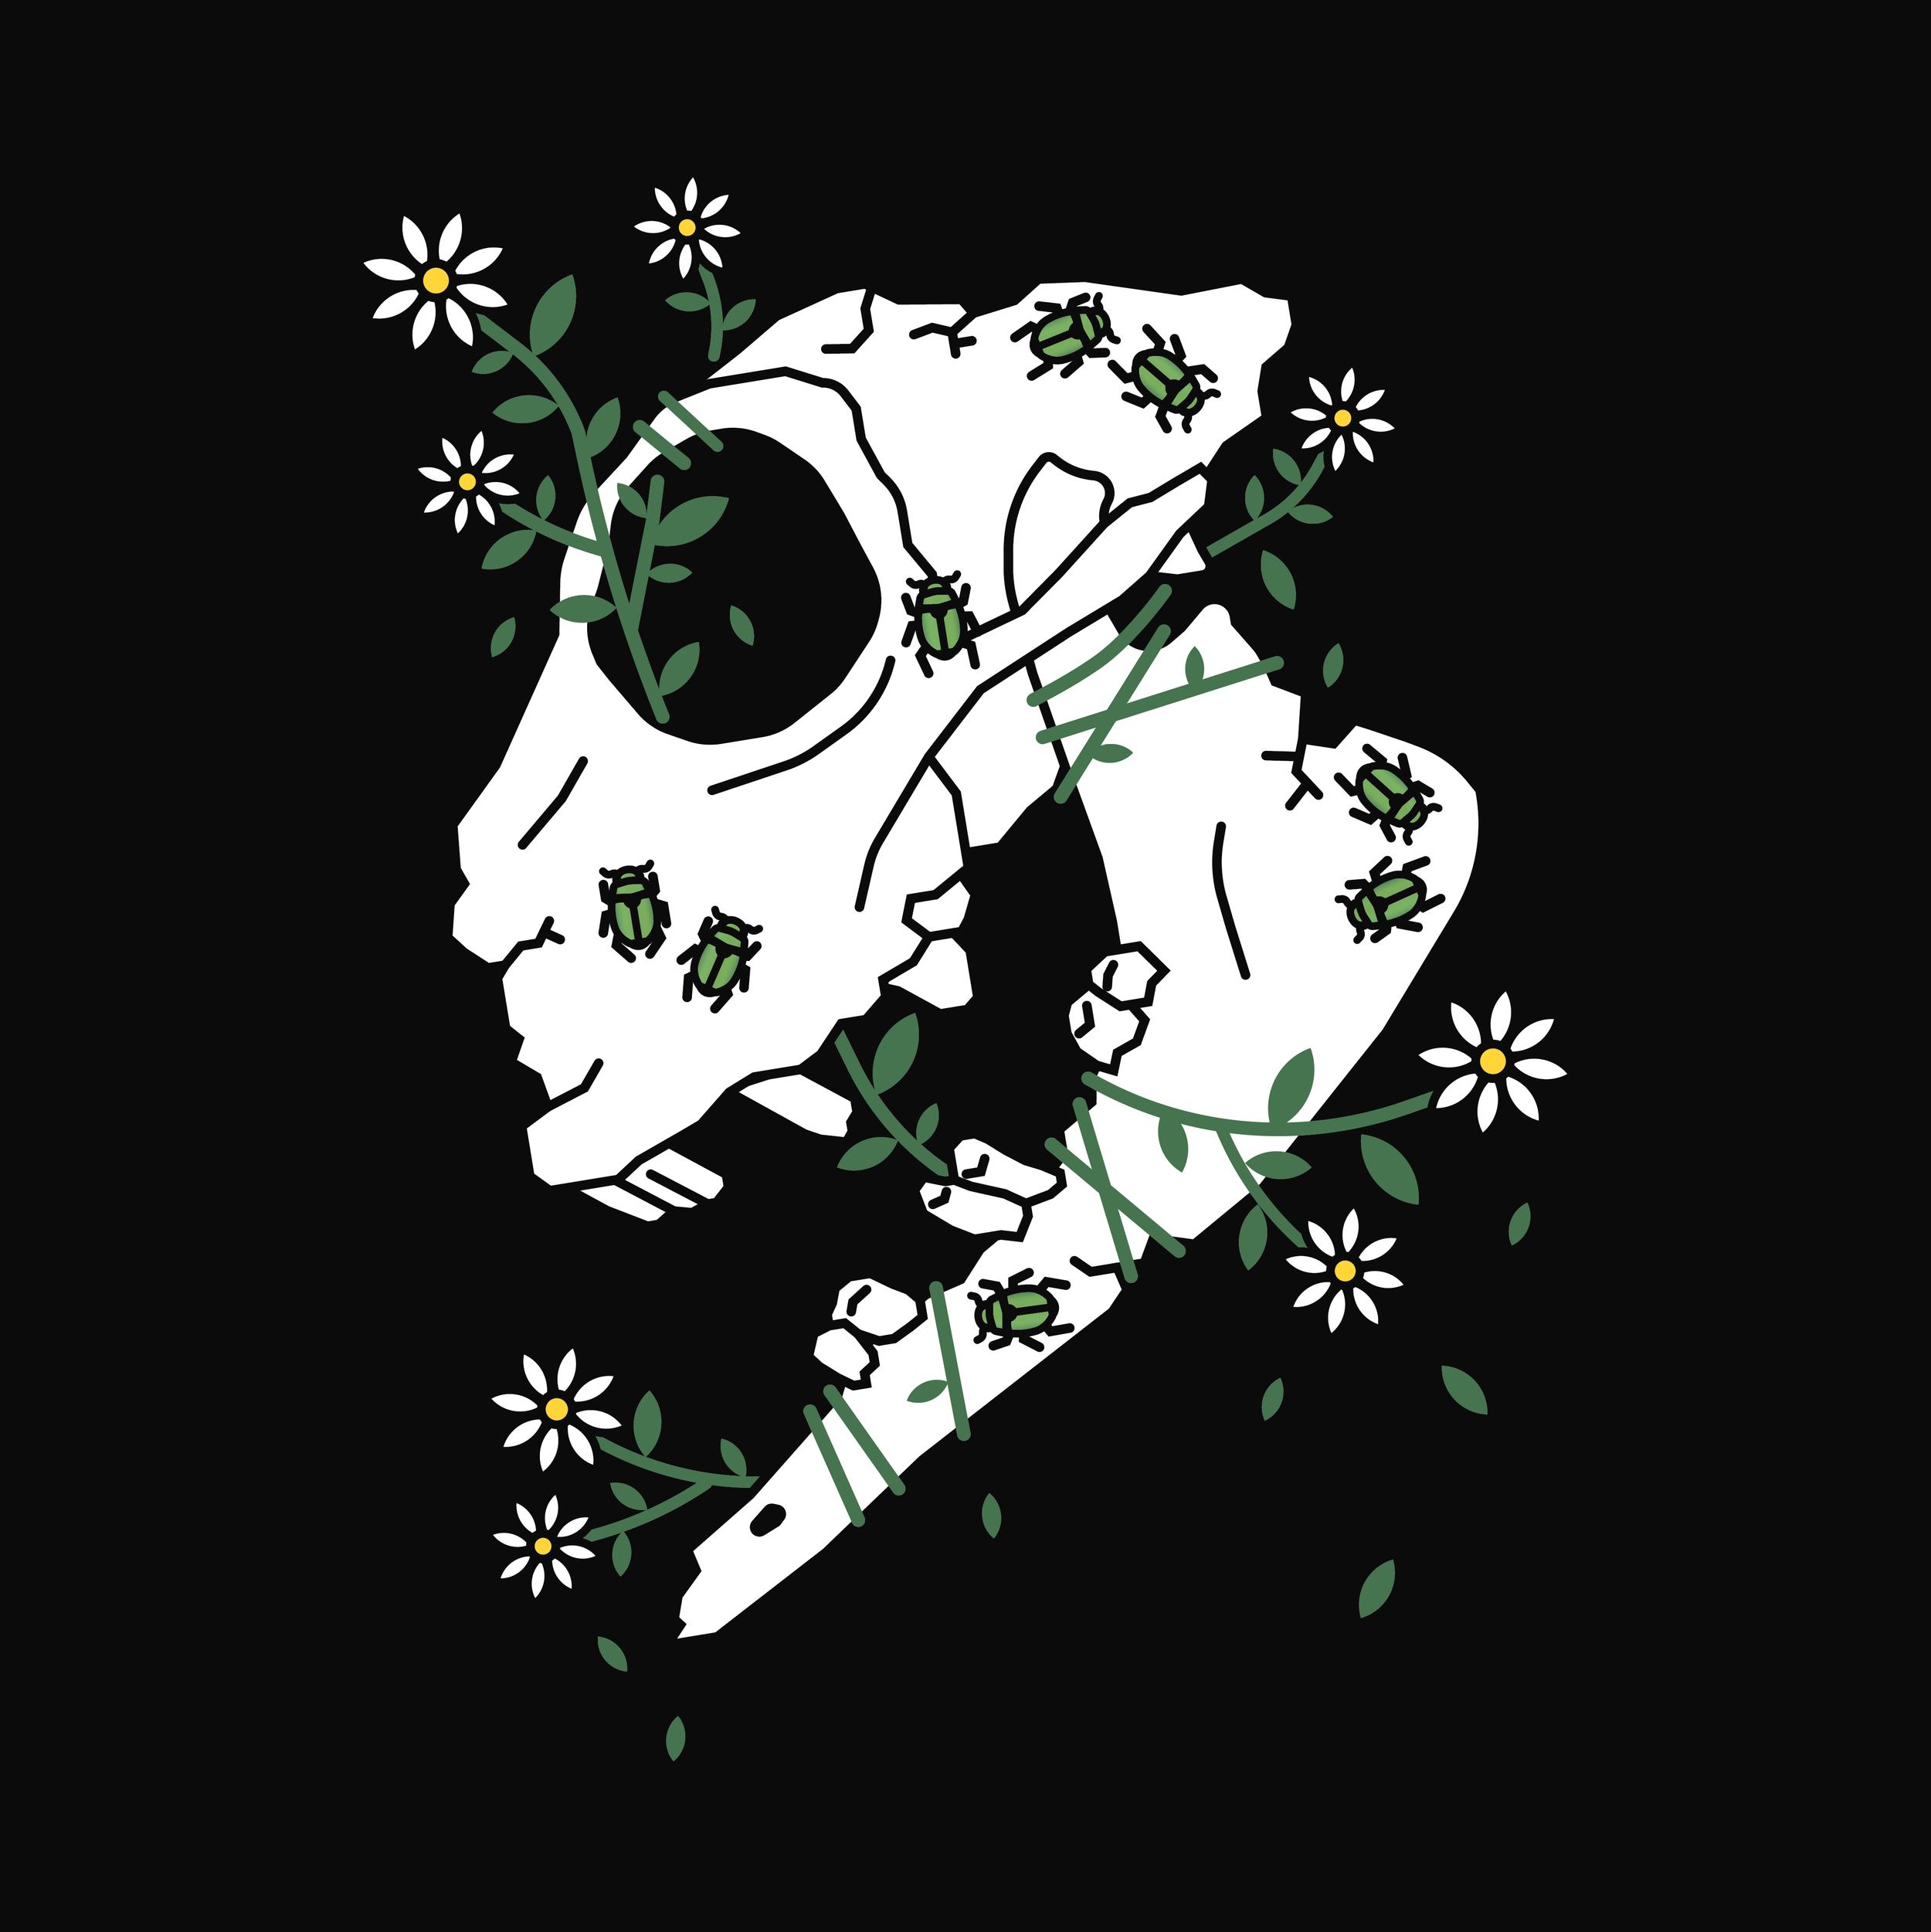 grave digger-02.png